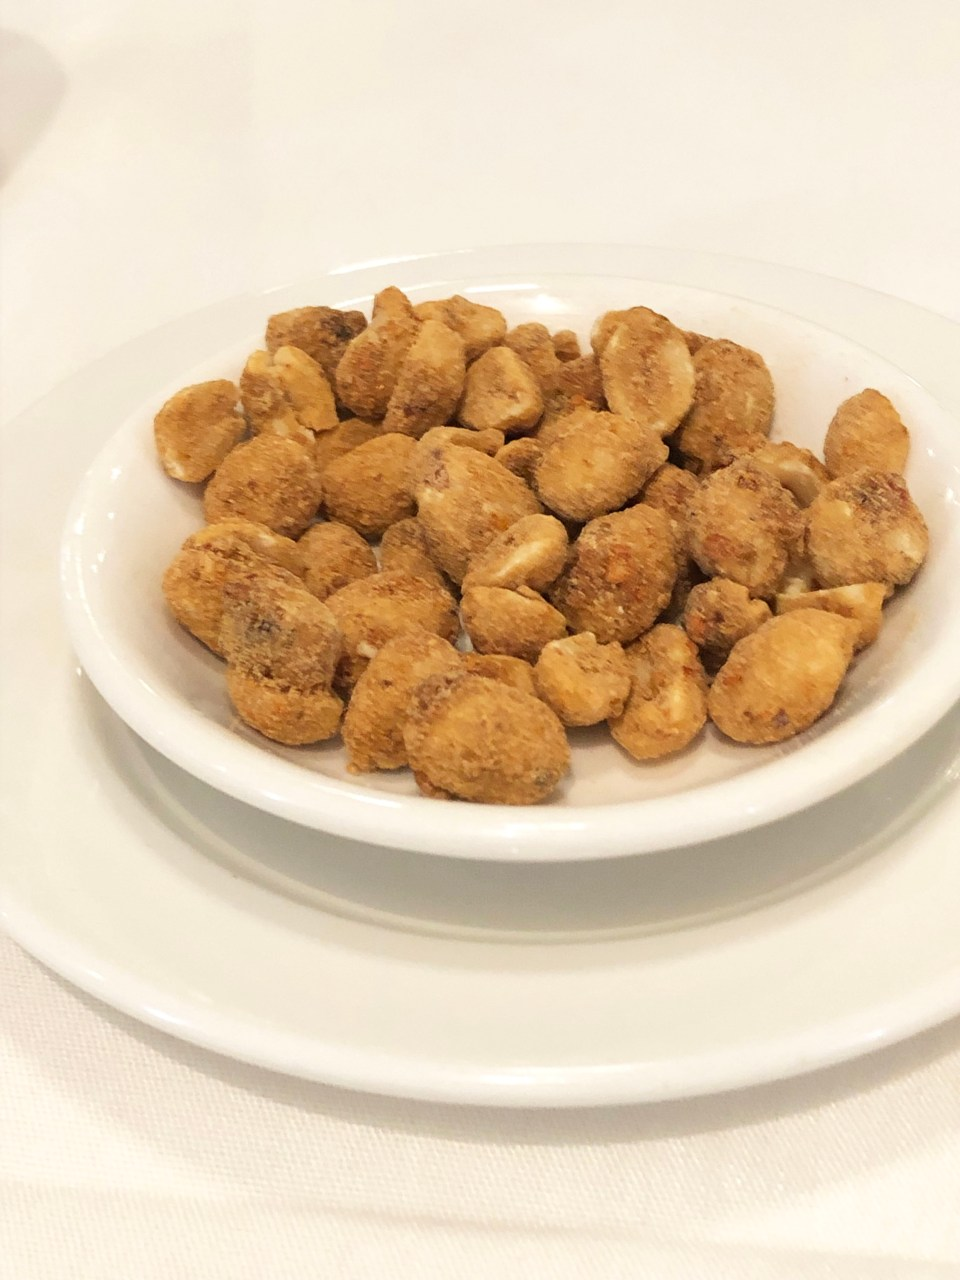 Chef Yang's 46 - Nuts